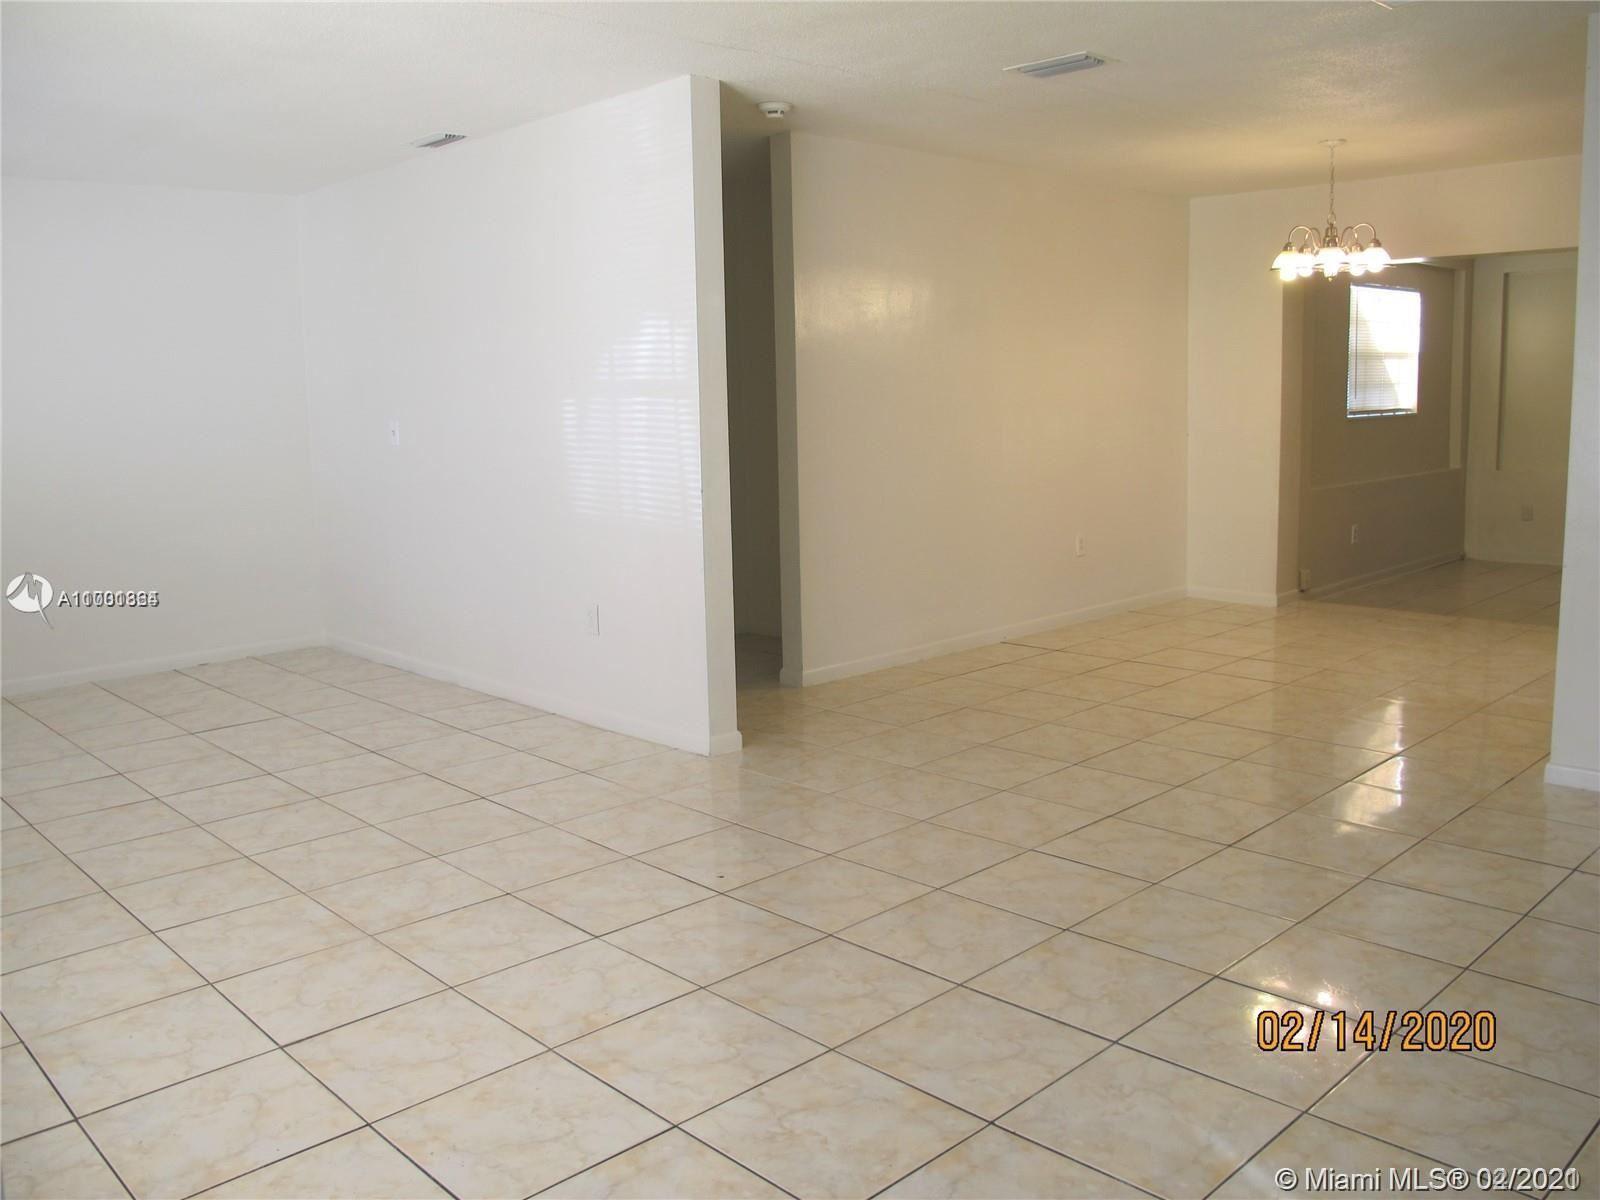 Photo of 5987 NW 16th St, Sunrise, FL 33313 (MLS # A11001364)